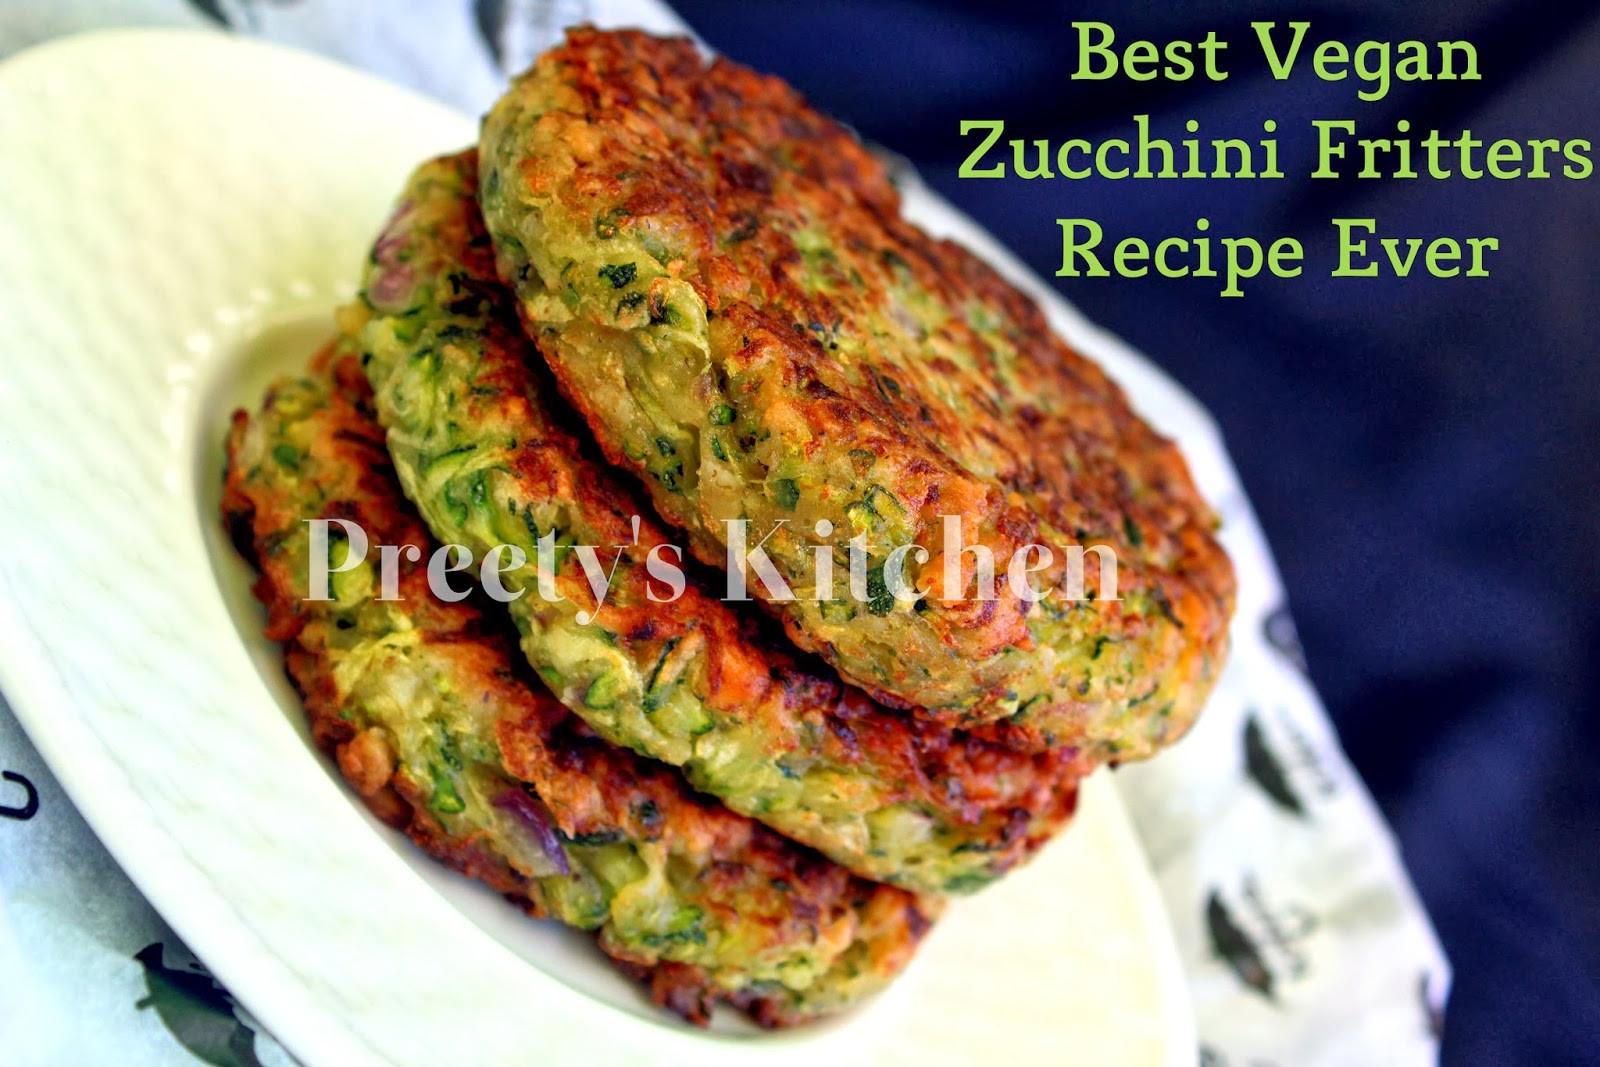 Vegan Zucchini Recipes  Preety s Kitchen Best Vegan Zucchini Fritters Ever